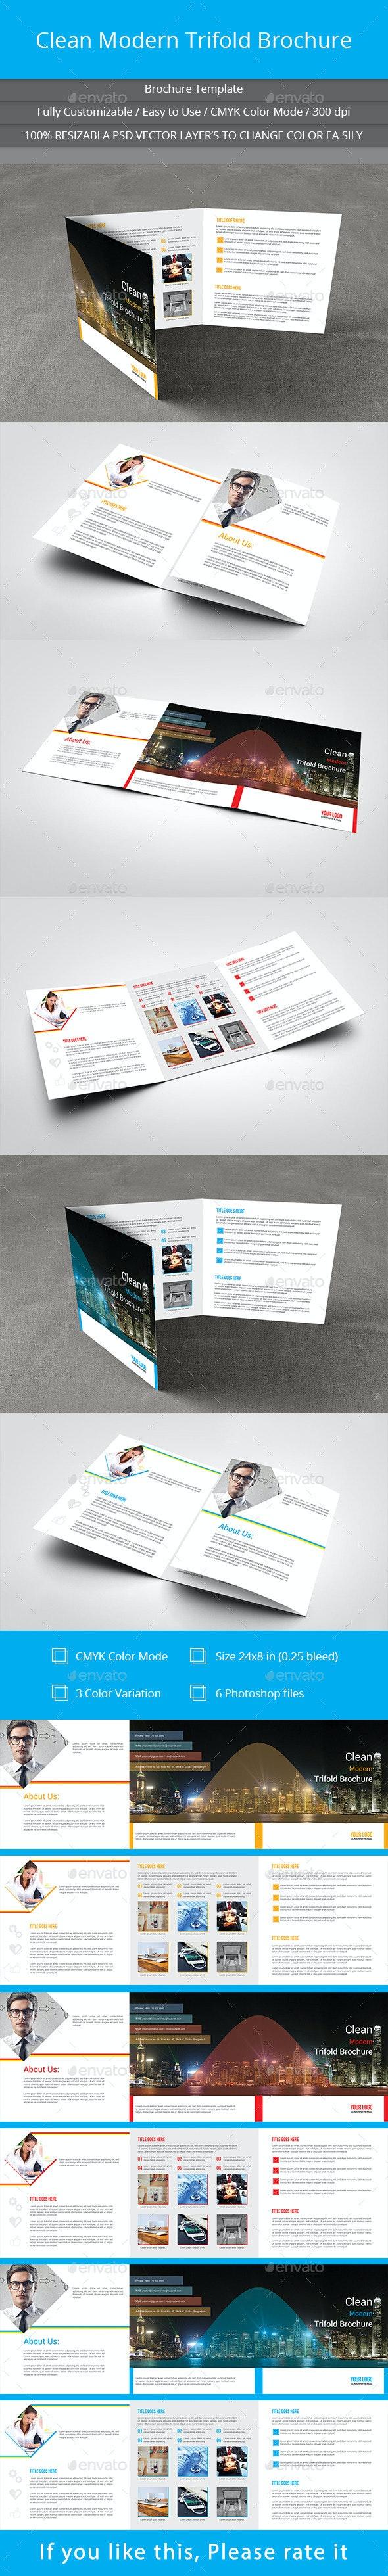 Clean Modern Trifold Brochure  - Brochures Print Templates